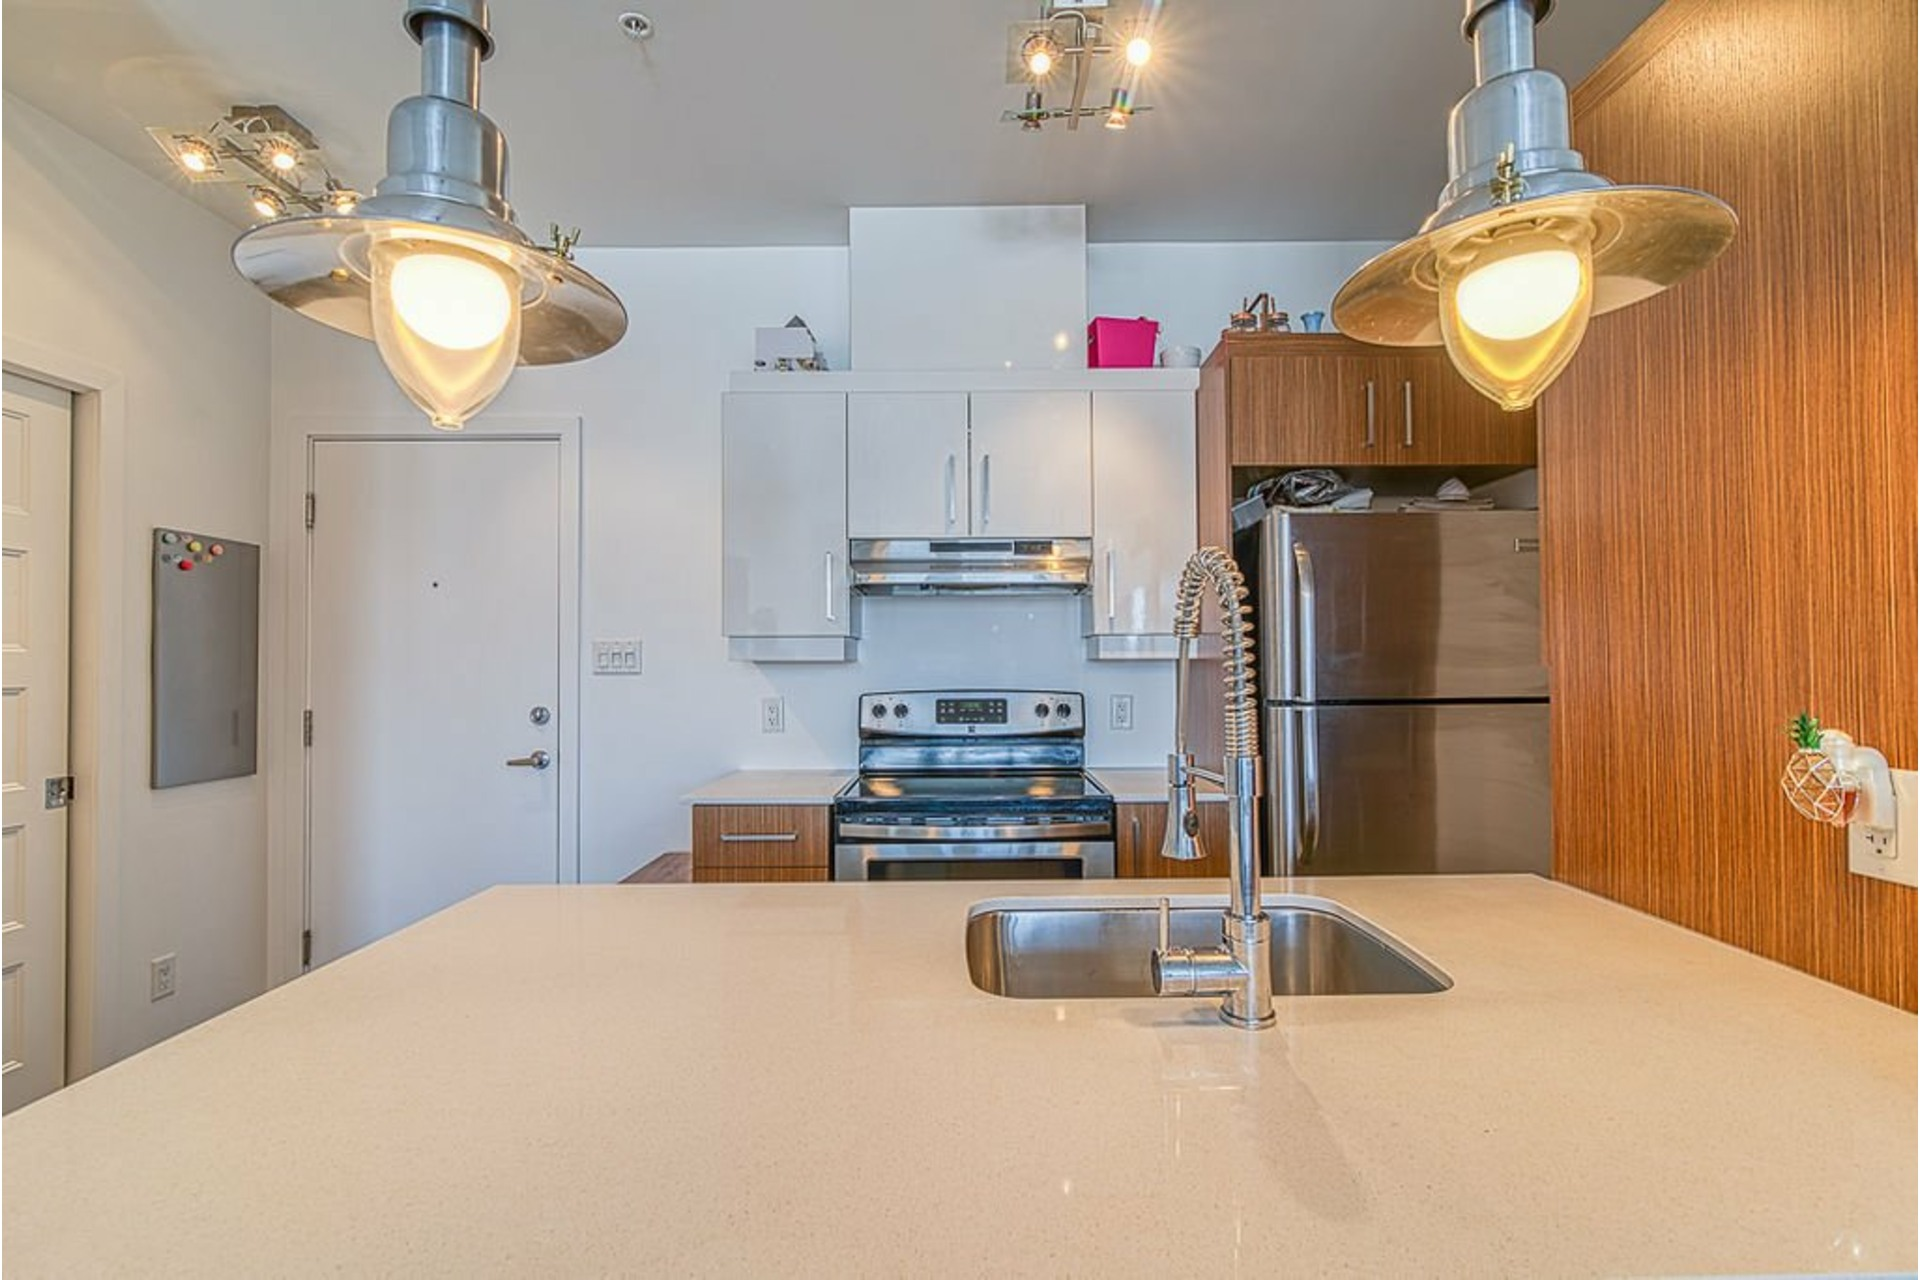 image 5 - Apartment For sale Blainville - 4 rooms